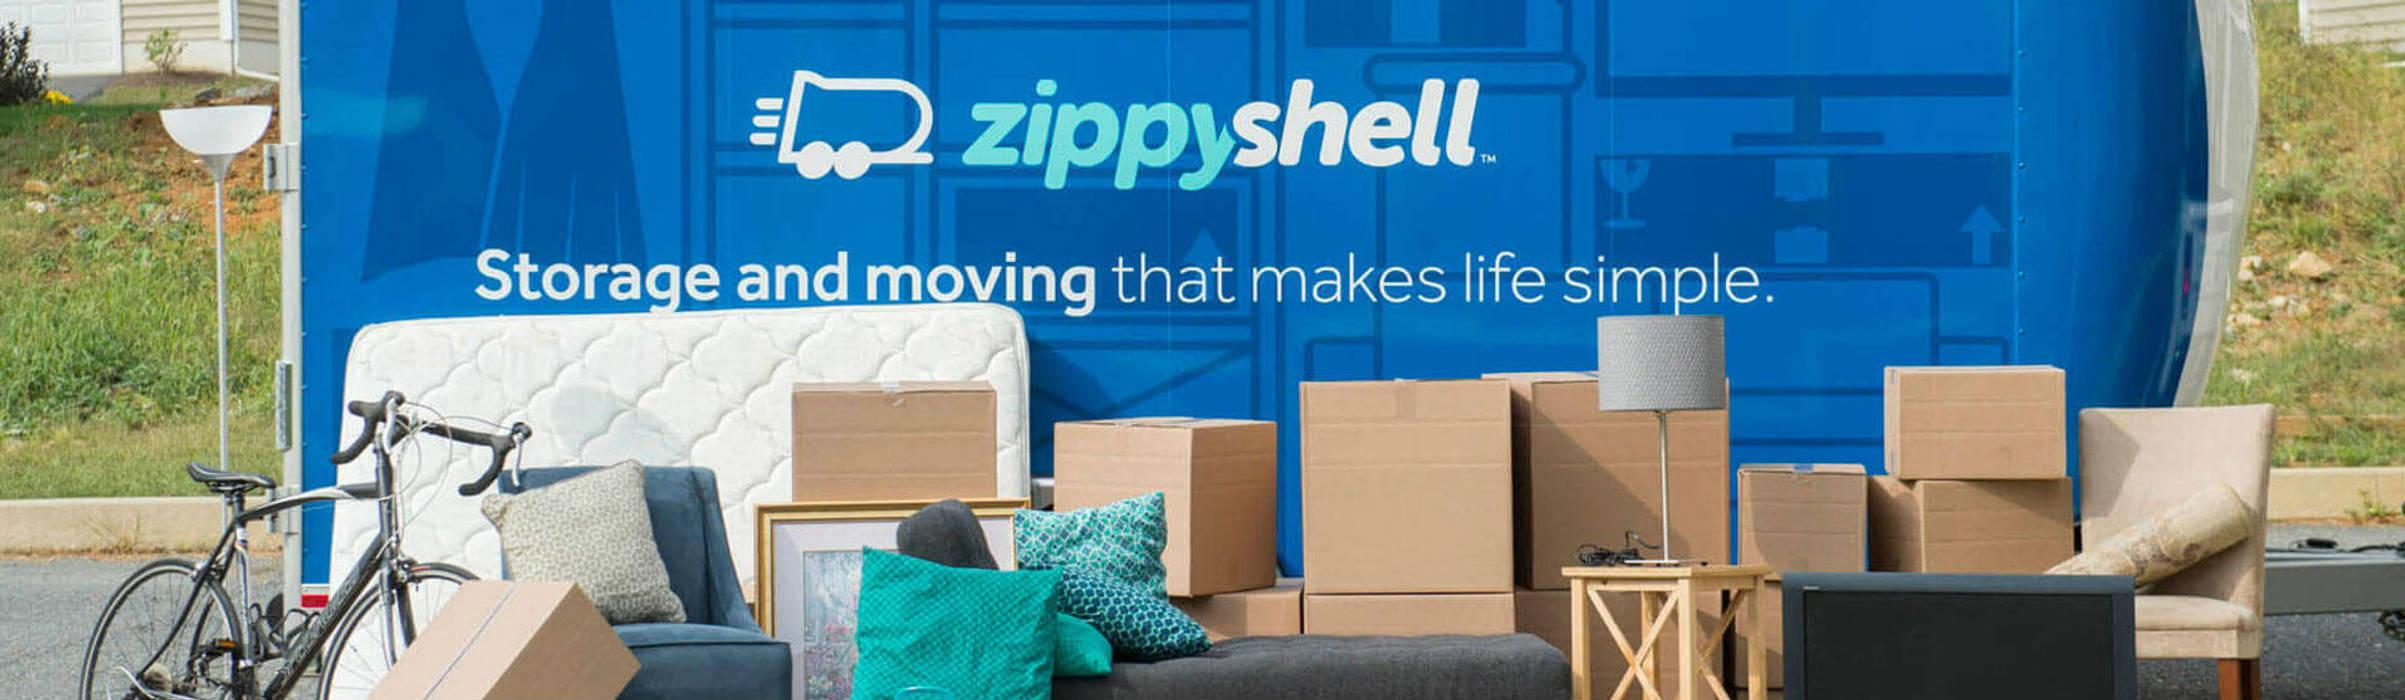 Case in stile industriale di Zippy Shell of Greater Philadelphia Industrial